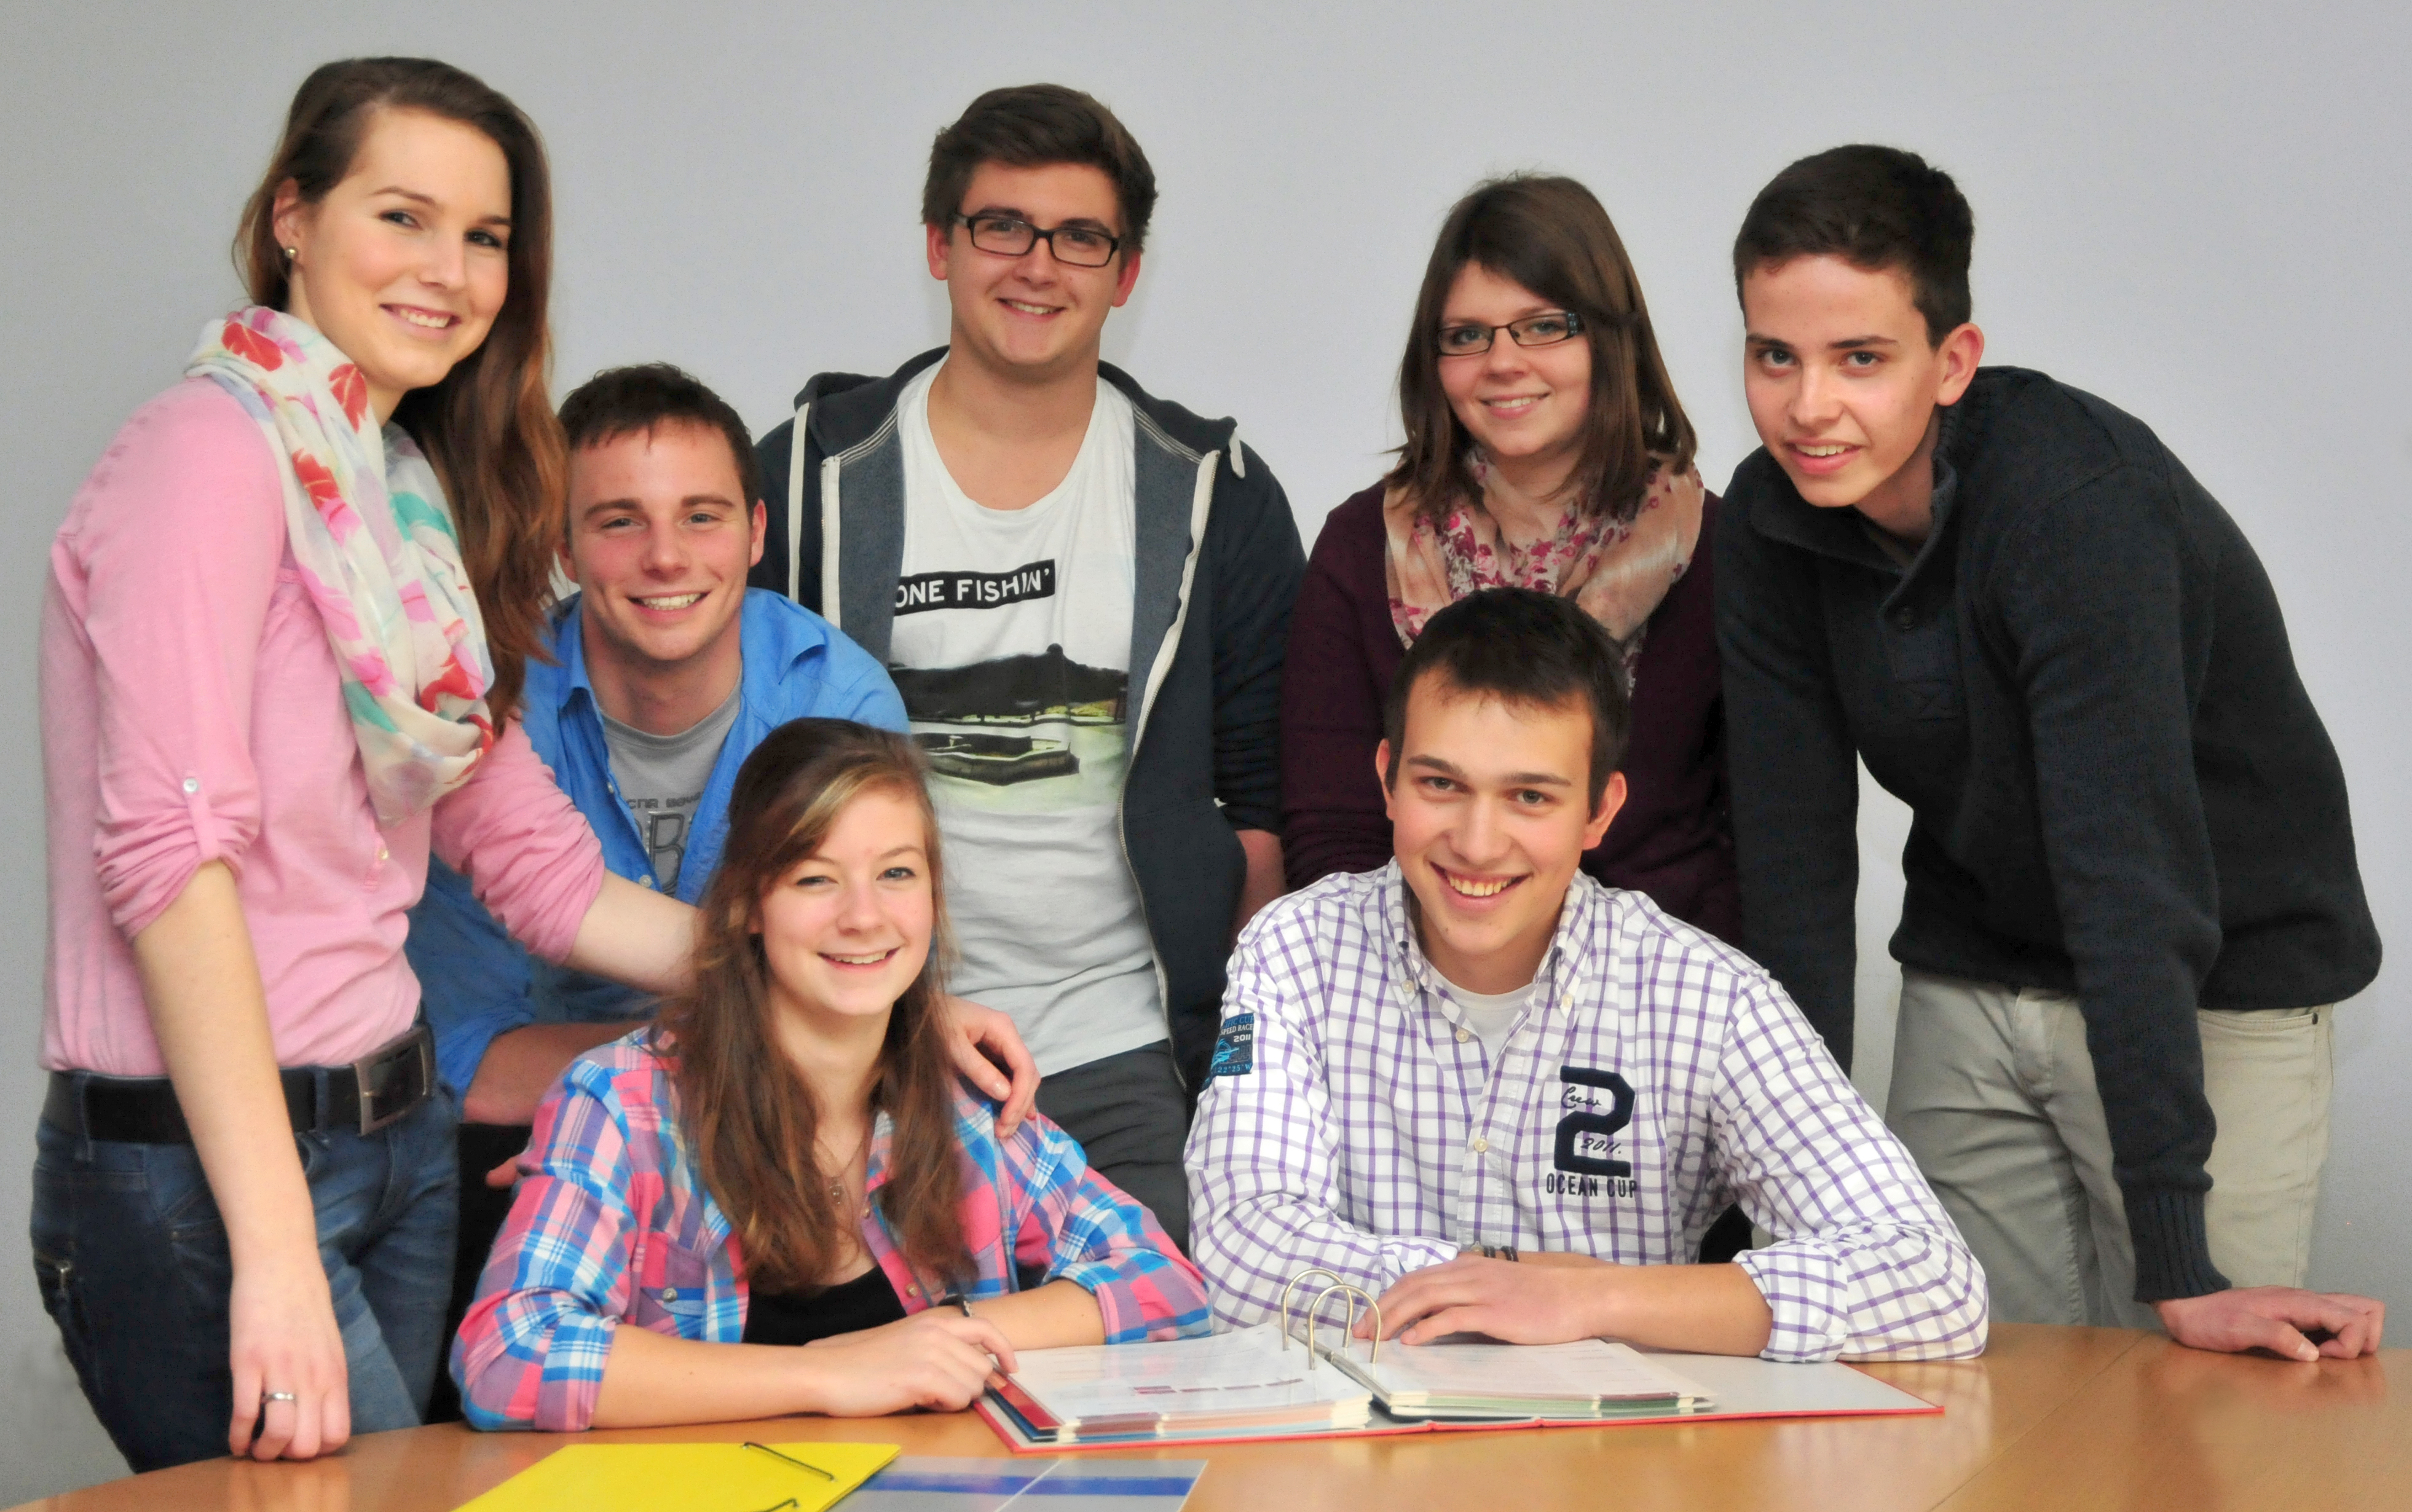 Ausbildung | Kreis Steinfurt